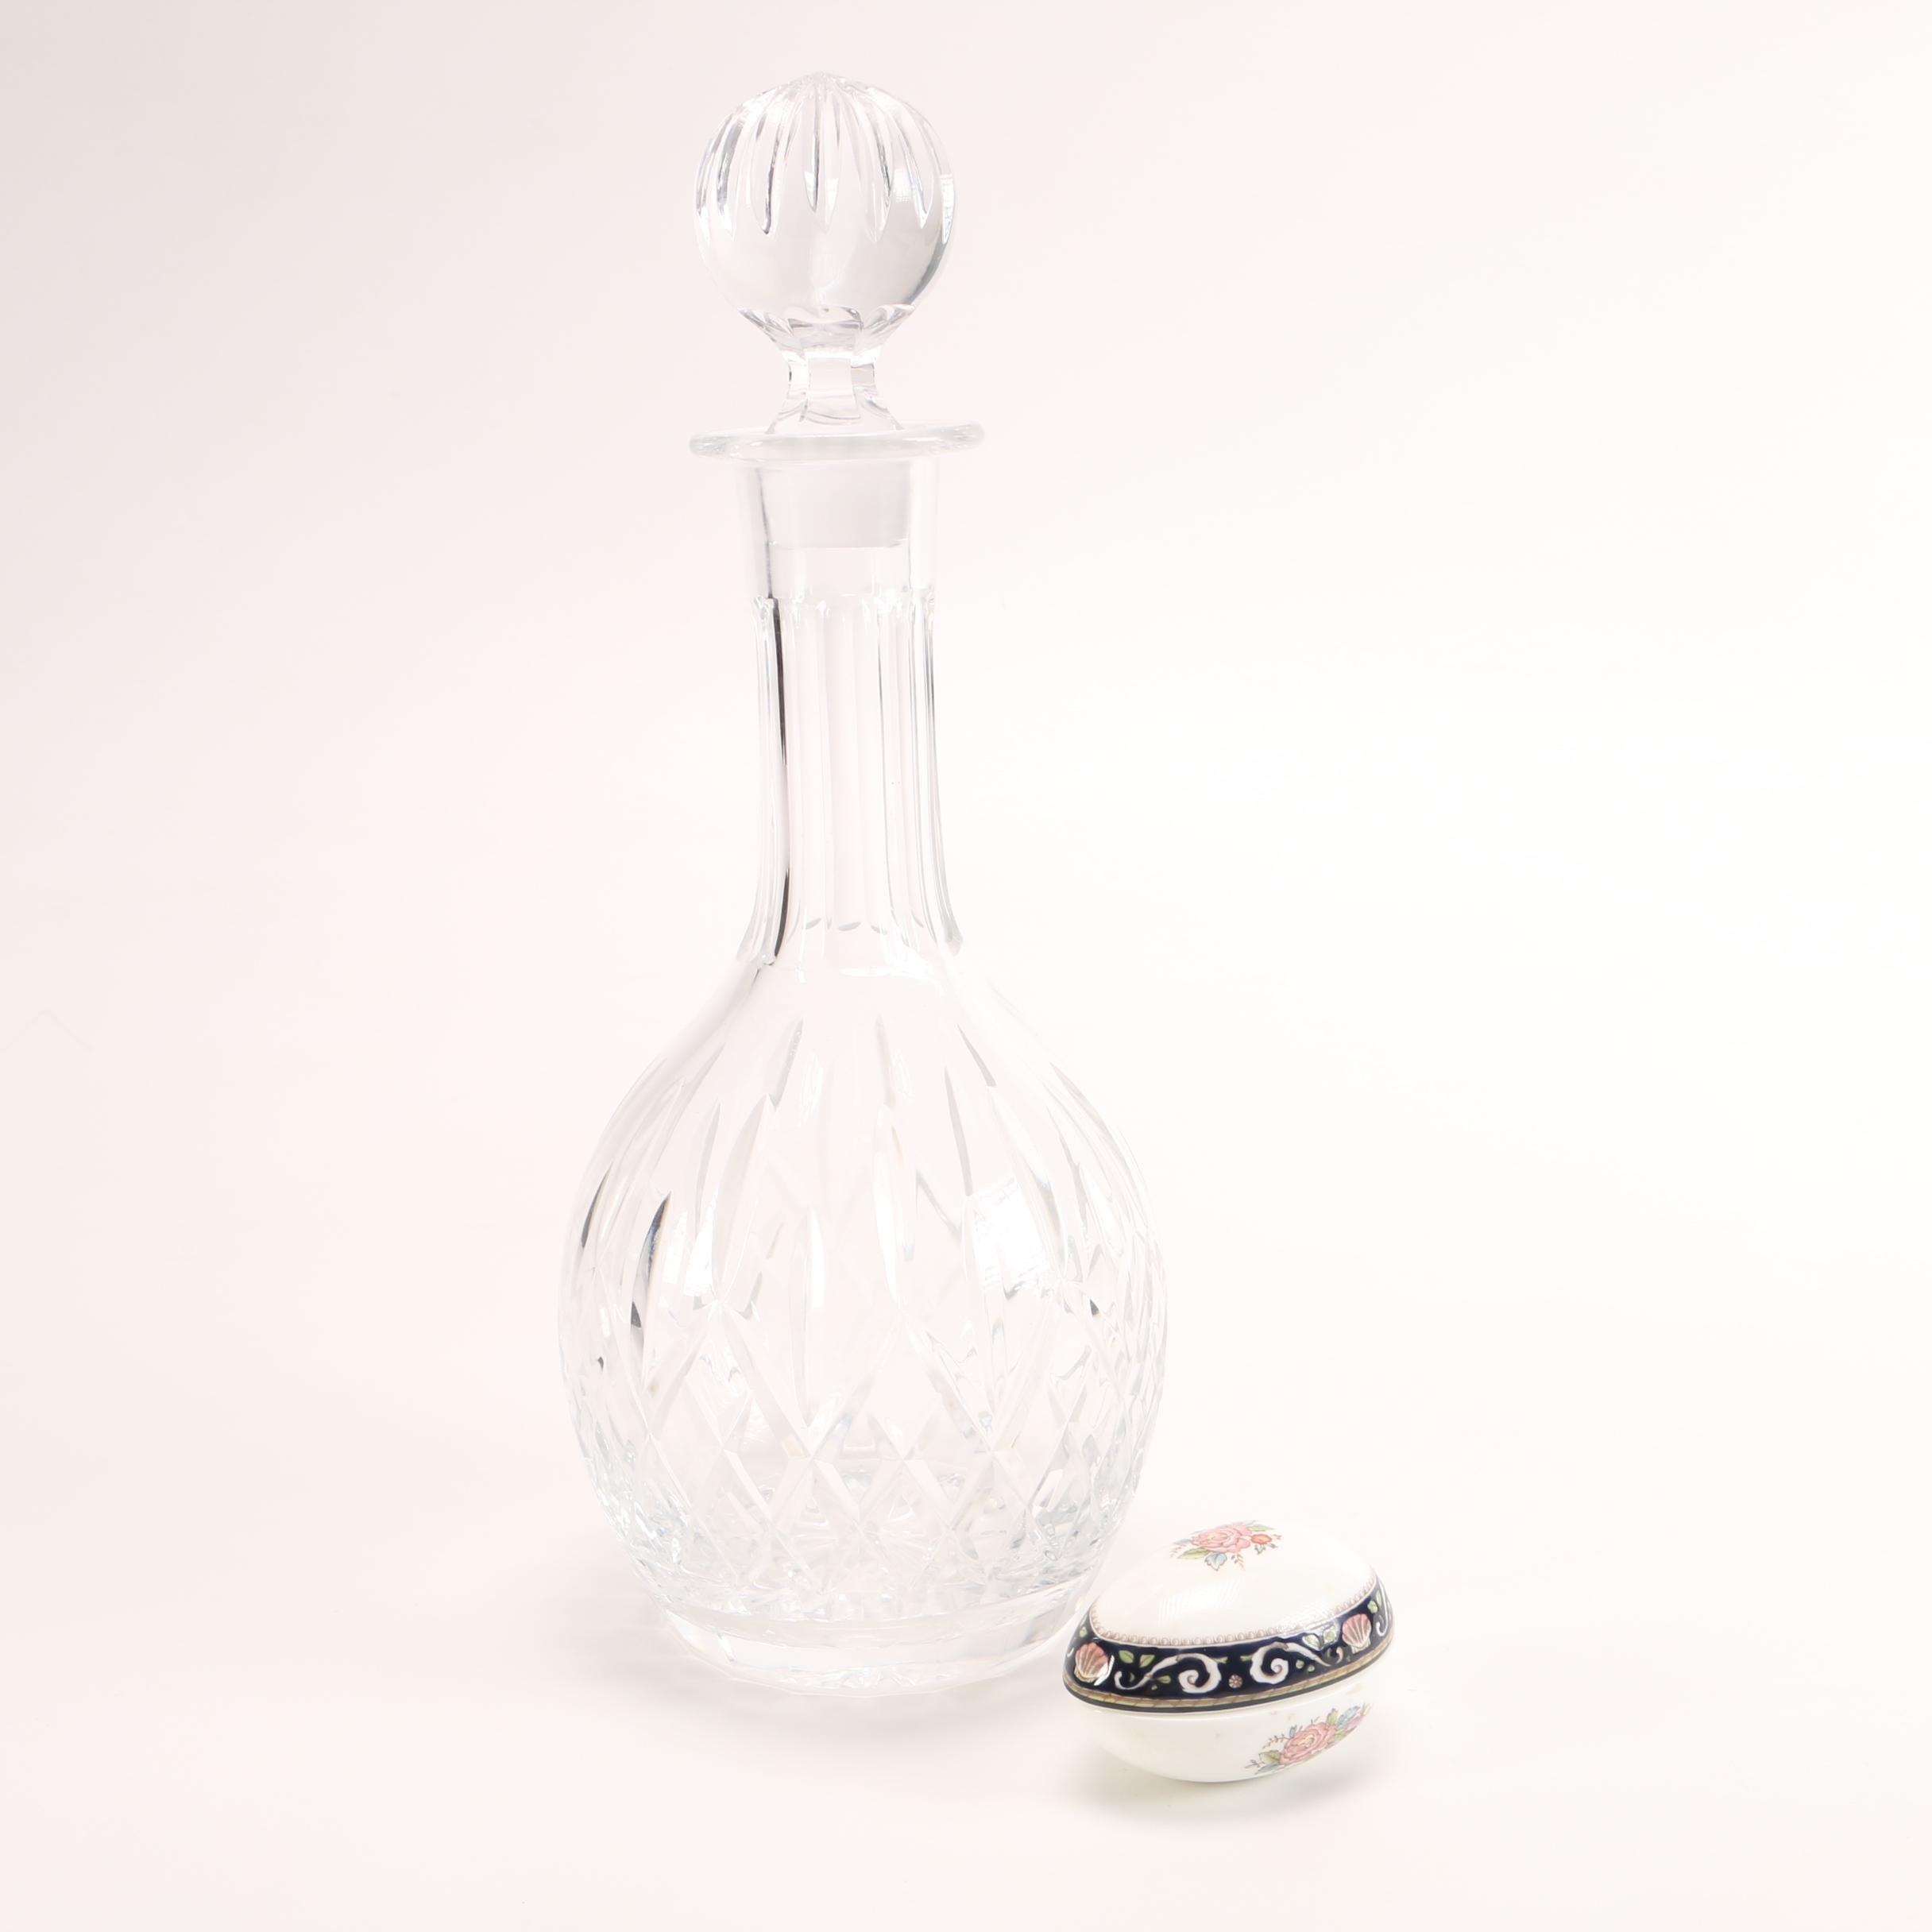 Wedgwood Crystal Decanter and Trinket Box